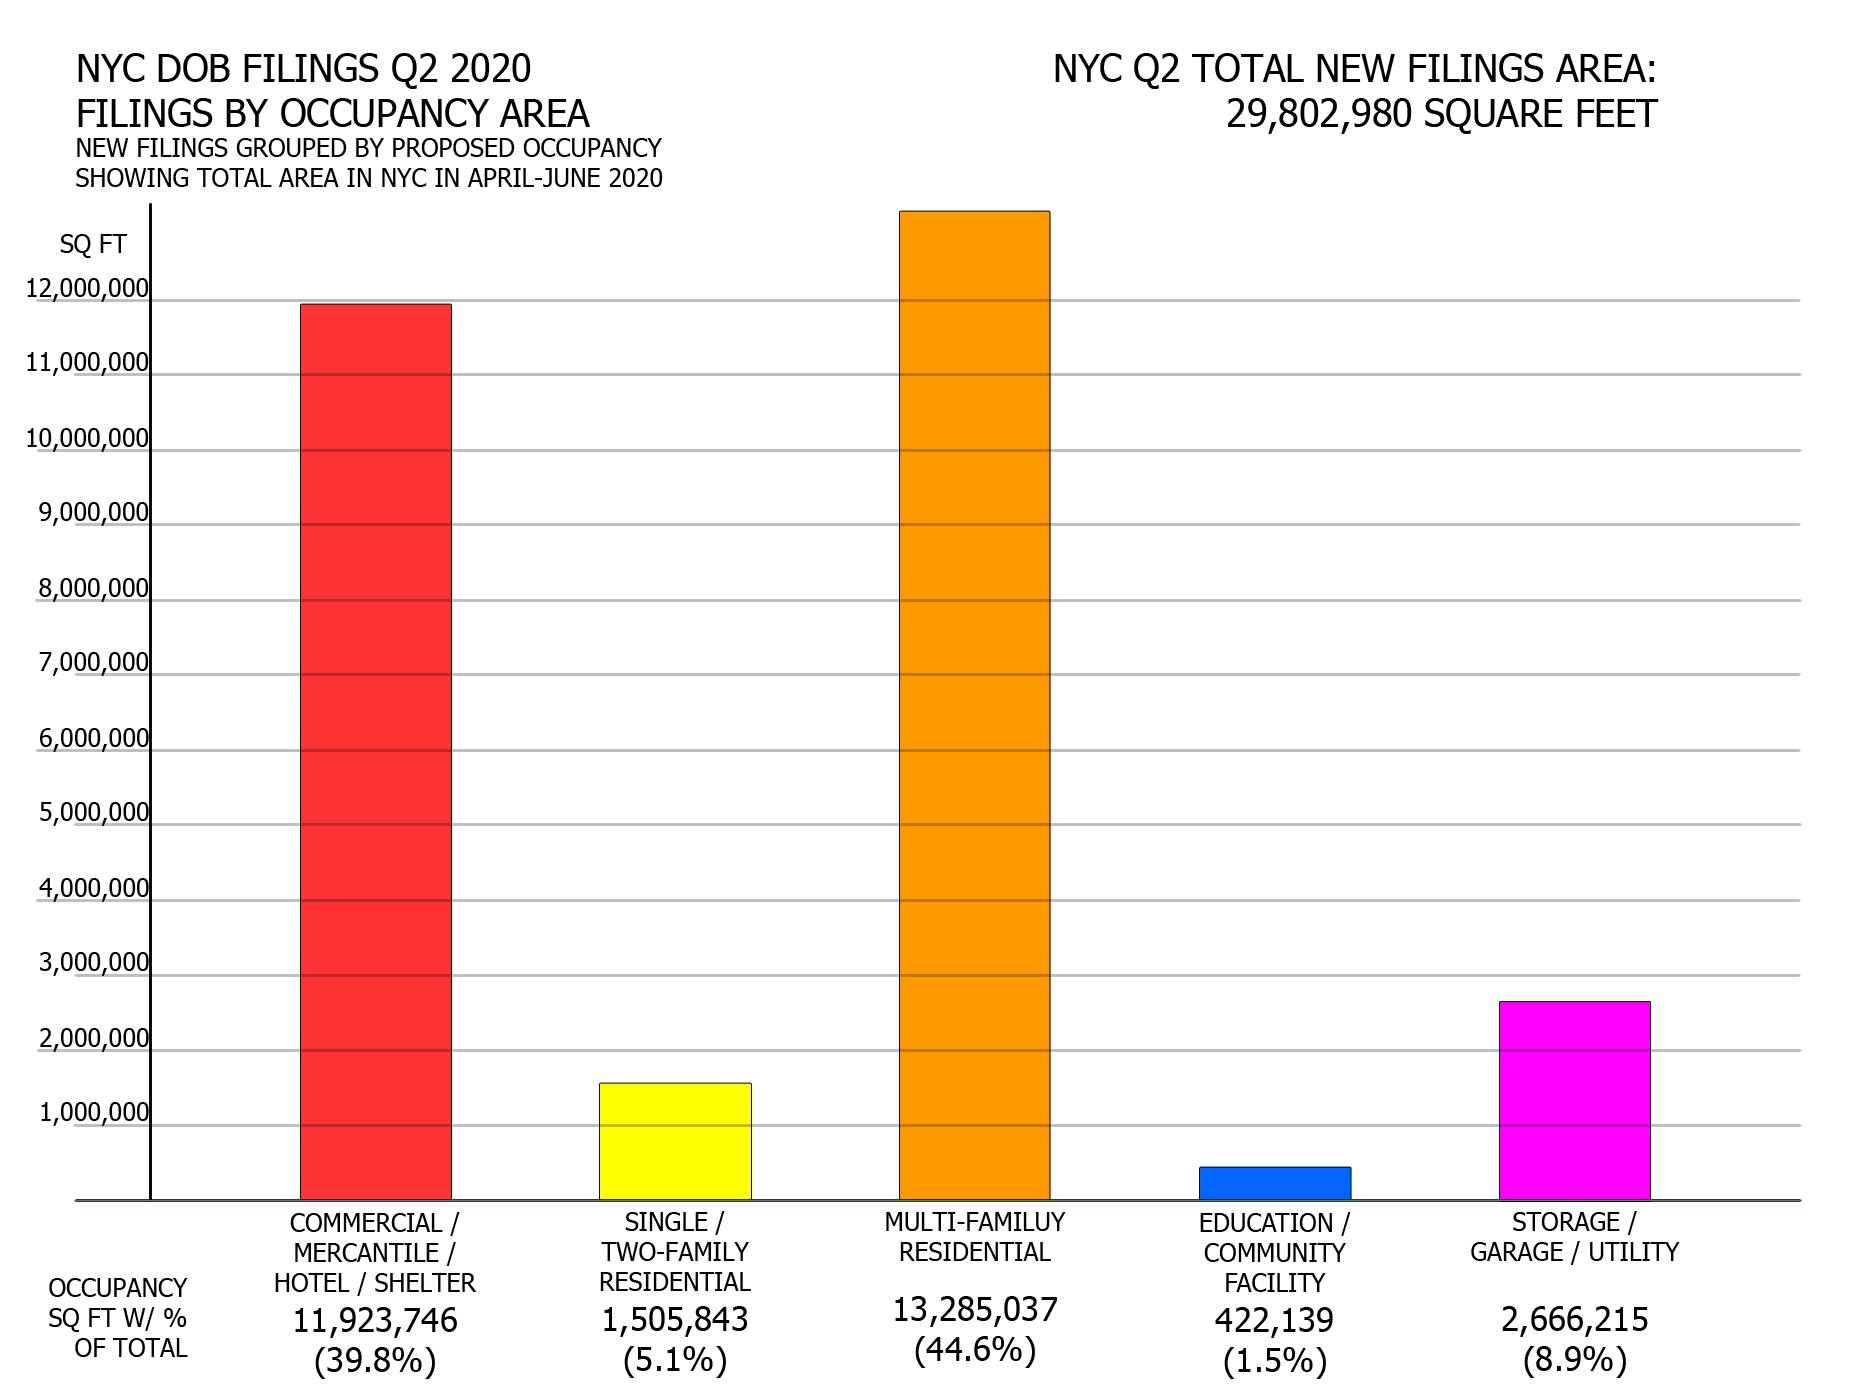 NYC Q2 2020 filings - Floor area per proposed occupancy. Image credit: Vitali Ogorodnikov